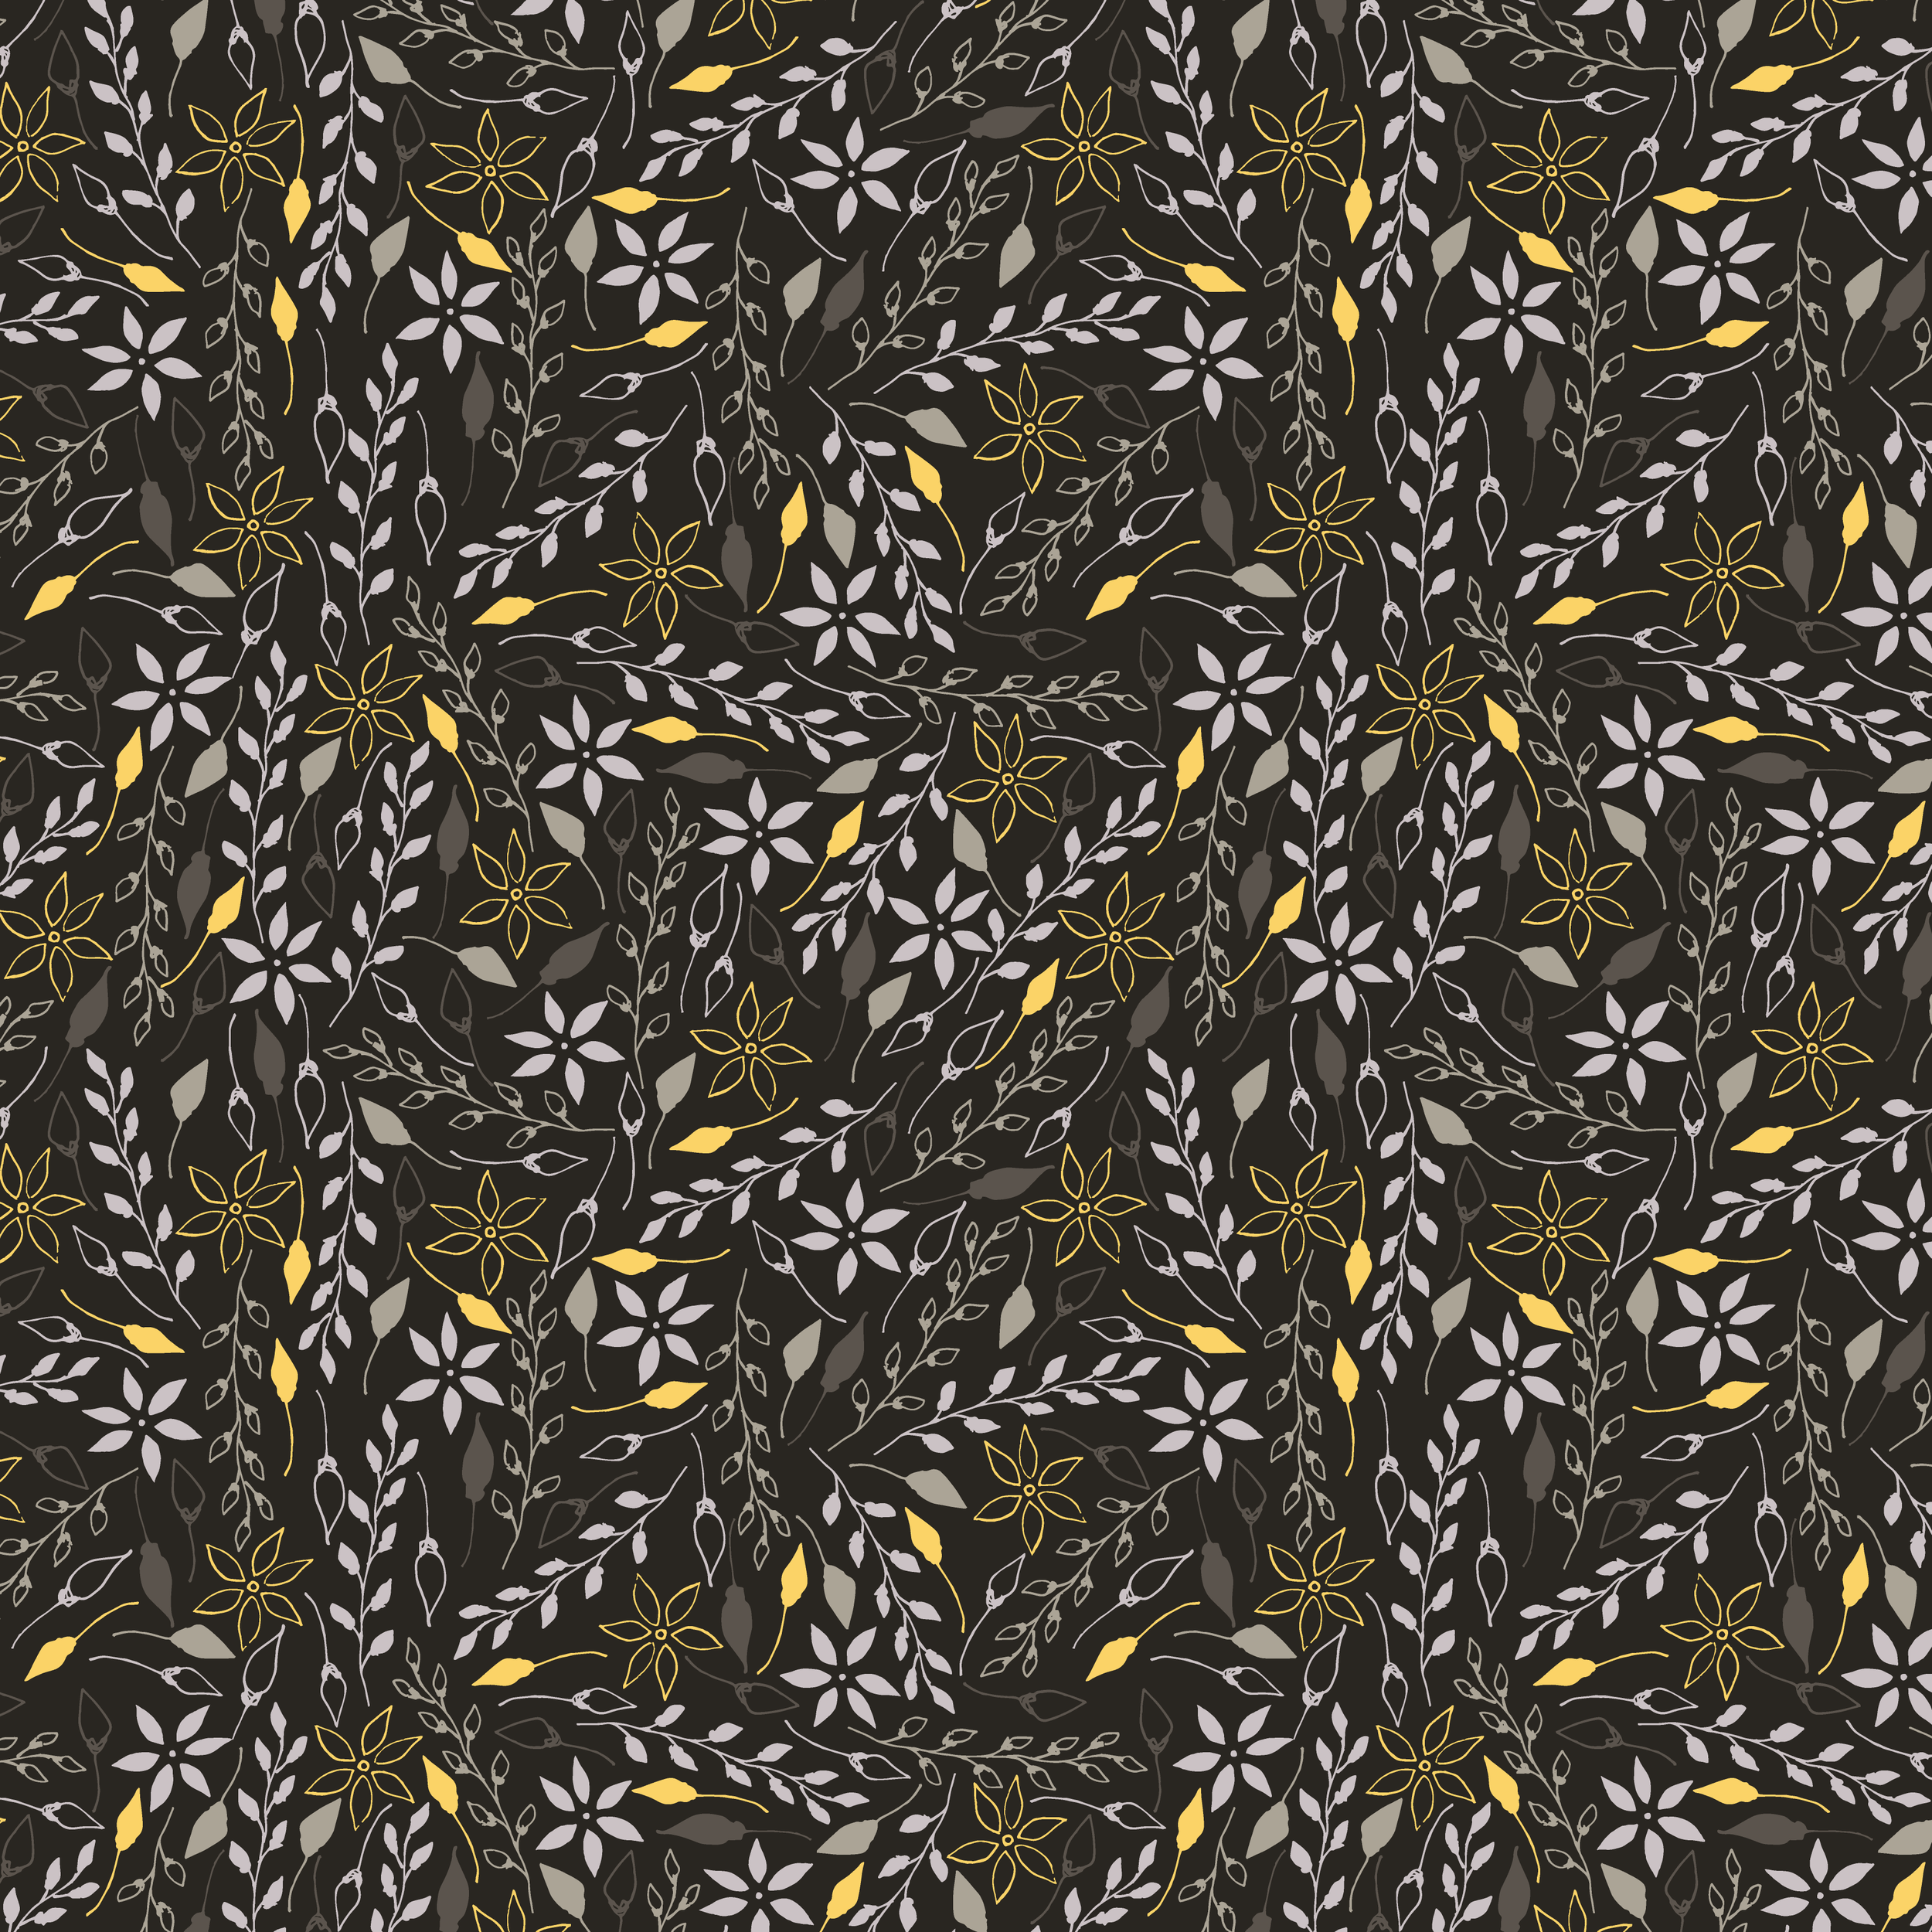 LWLP Patterns_Floral_Dark_PNG.png